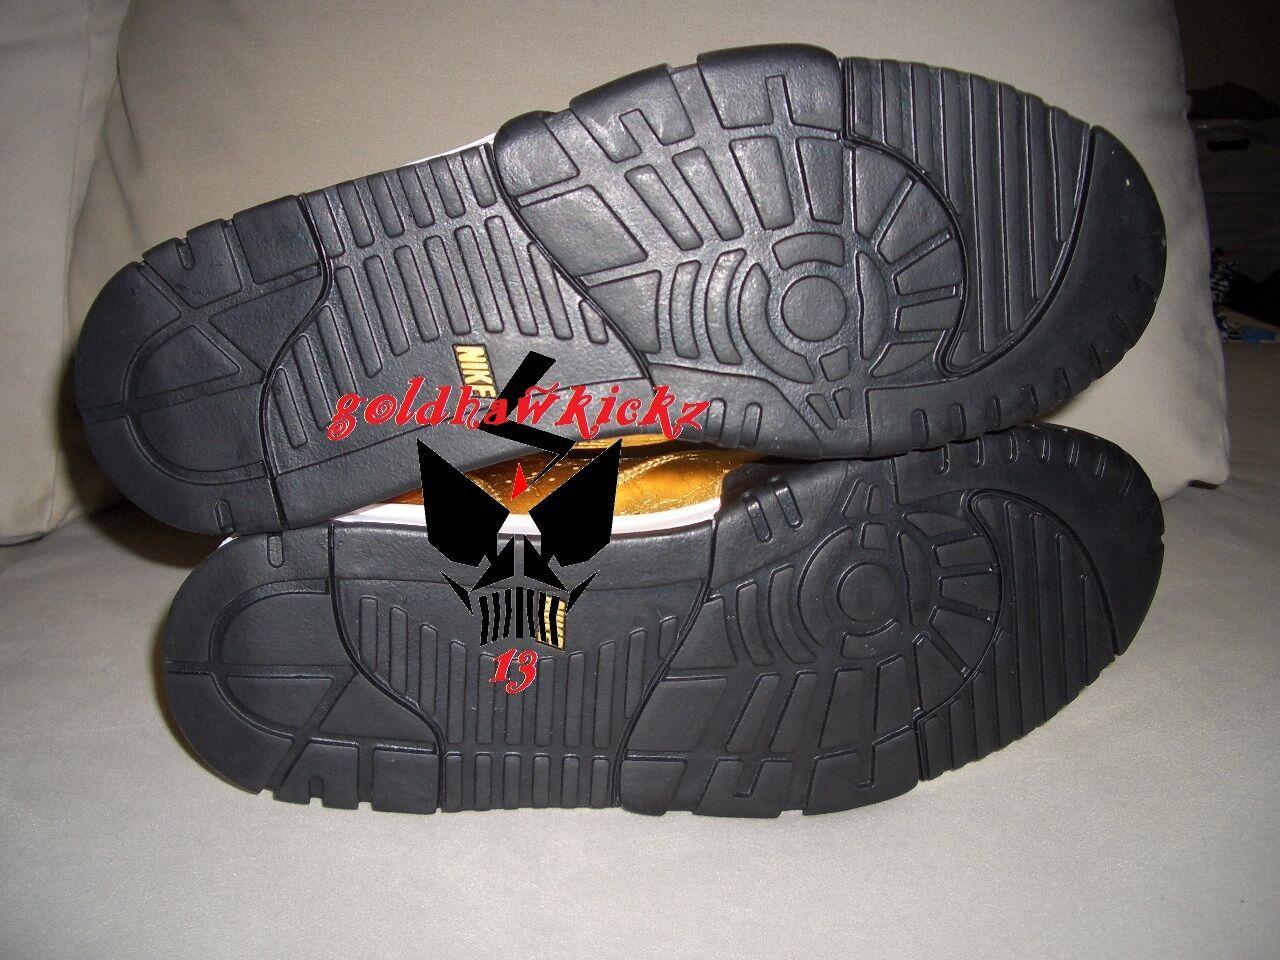 Nike Bowl Air Trainer 1 Premium Trainer QS NFL Super Bowl Nike 50  GOLD foil 840169-700 14fffd